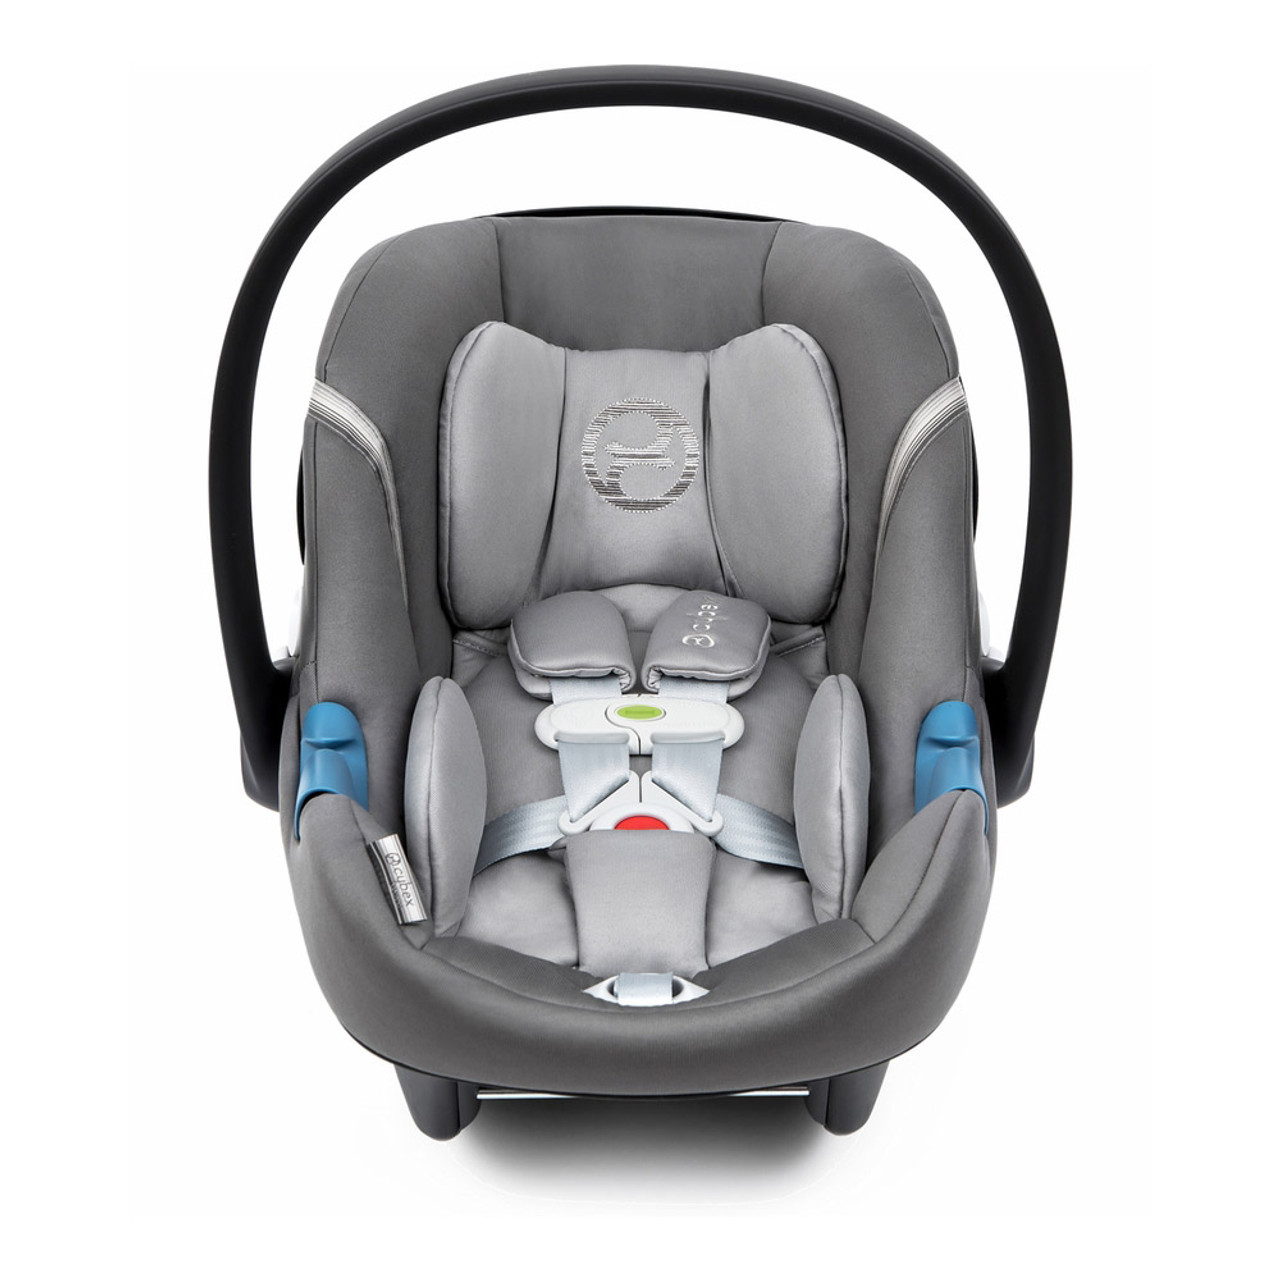 Image result for Cybex Aton M SensorSafe Car Seat